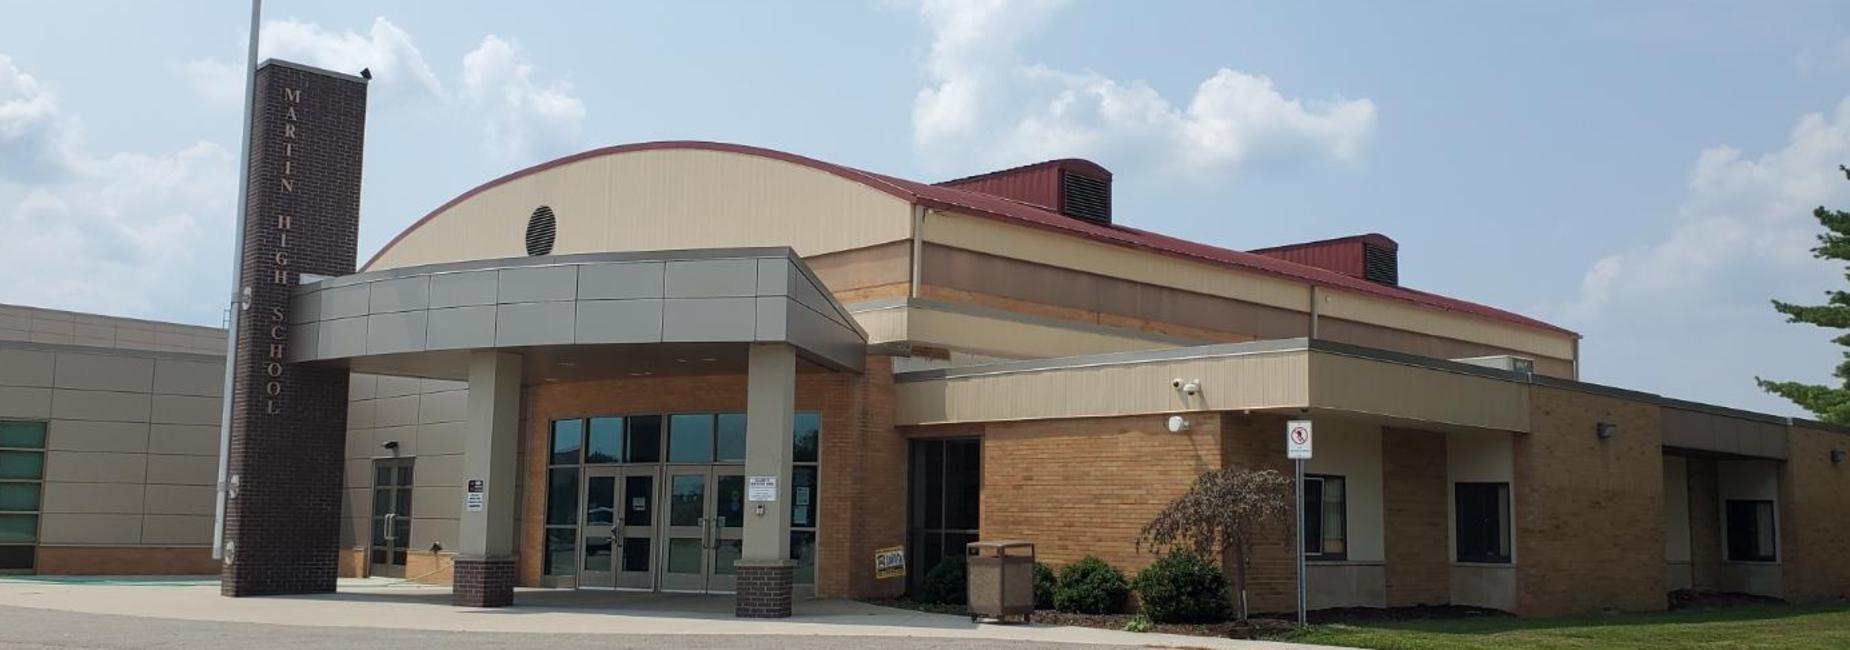 Martin Middle & High School